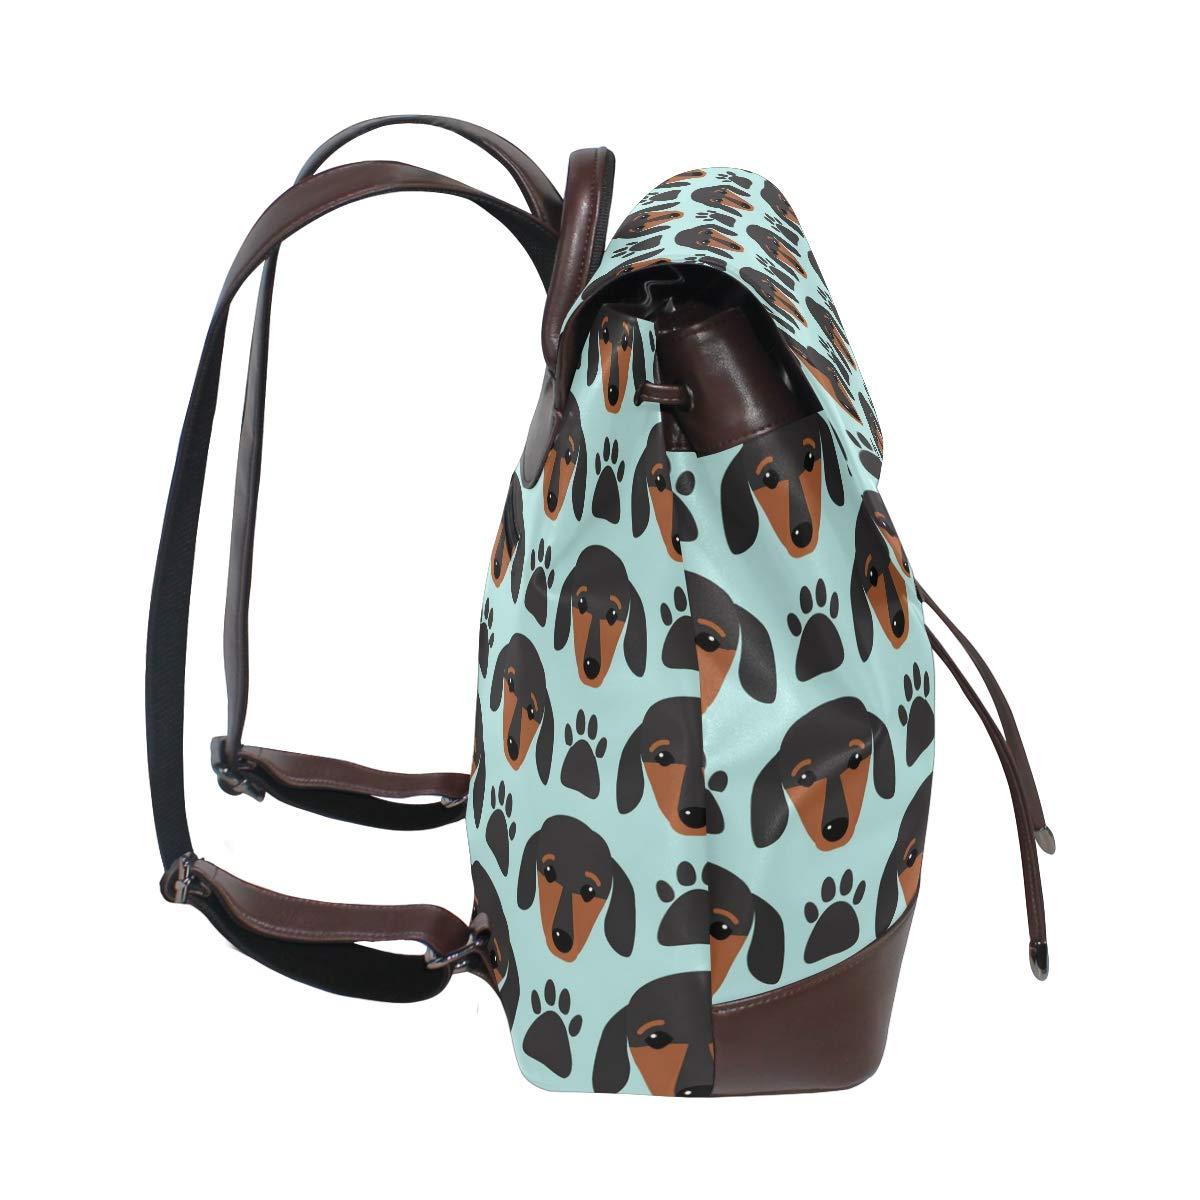 Unisex PU Leather Backpack Little Dachshund Puppy Head Print Womens Casual Daypack Mens Travel Sports Bag Boys College Bookbag